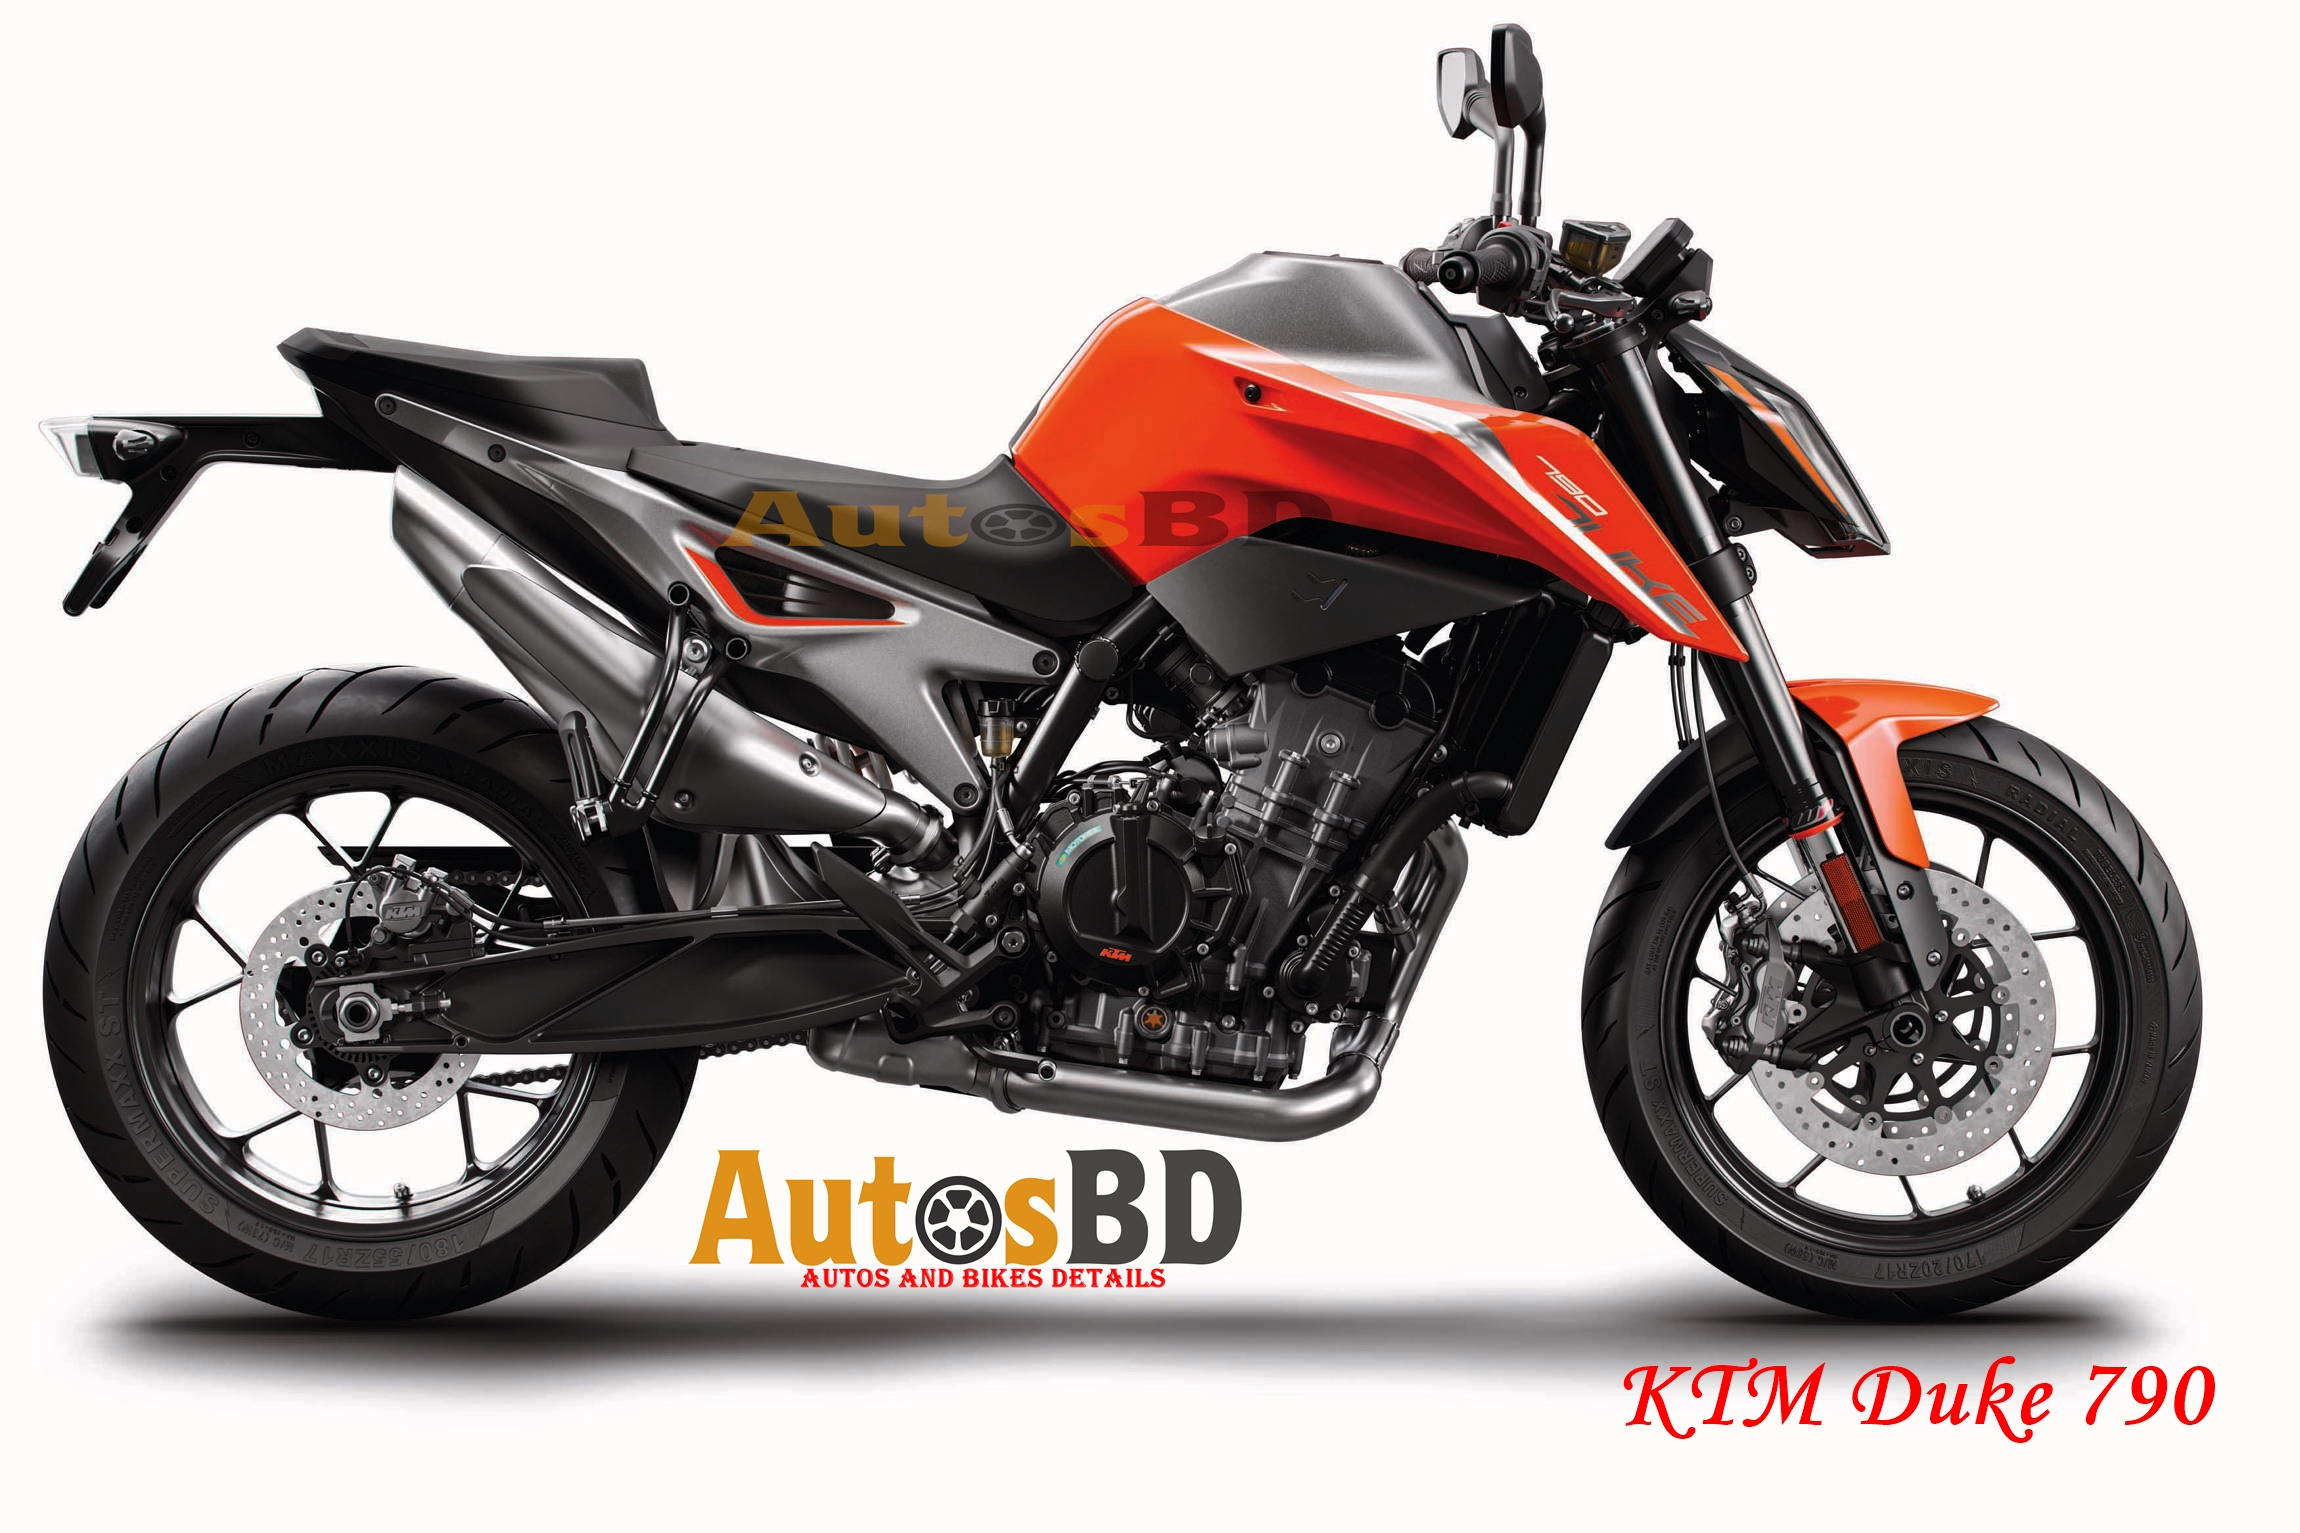 KTM Duke 790 Motorcycle Specification